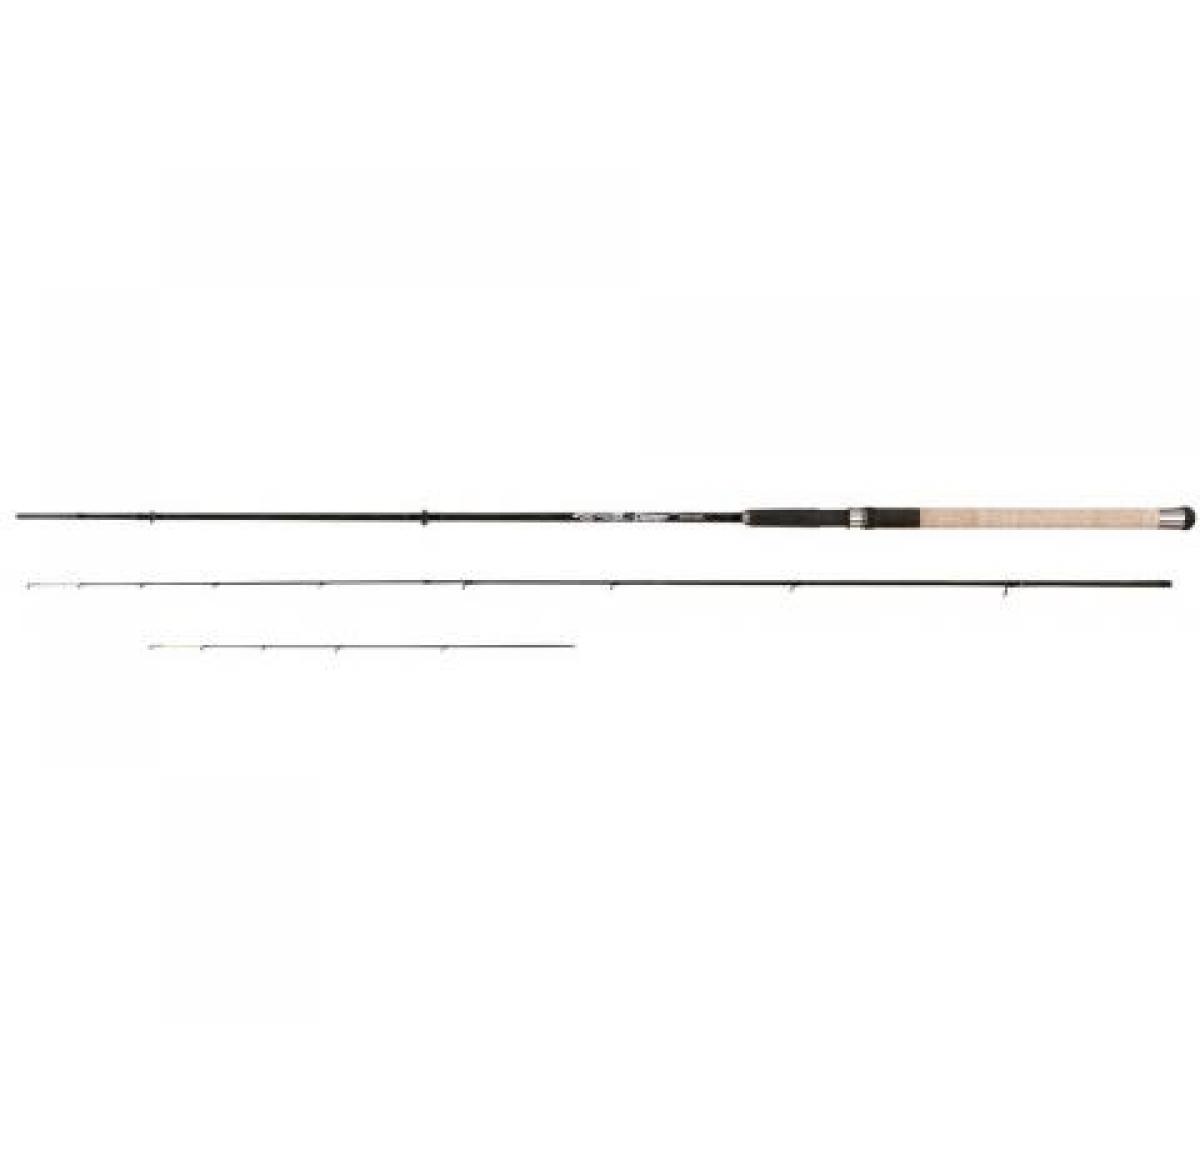 York Derby Picker 270 cm 5-28 g